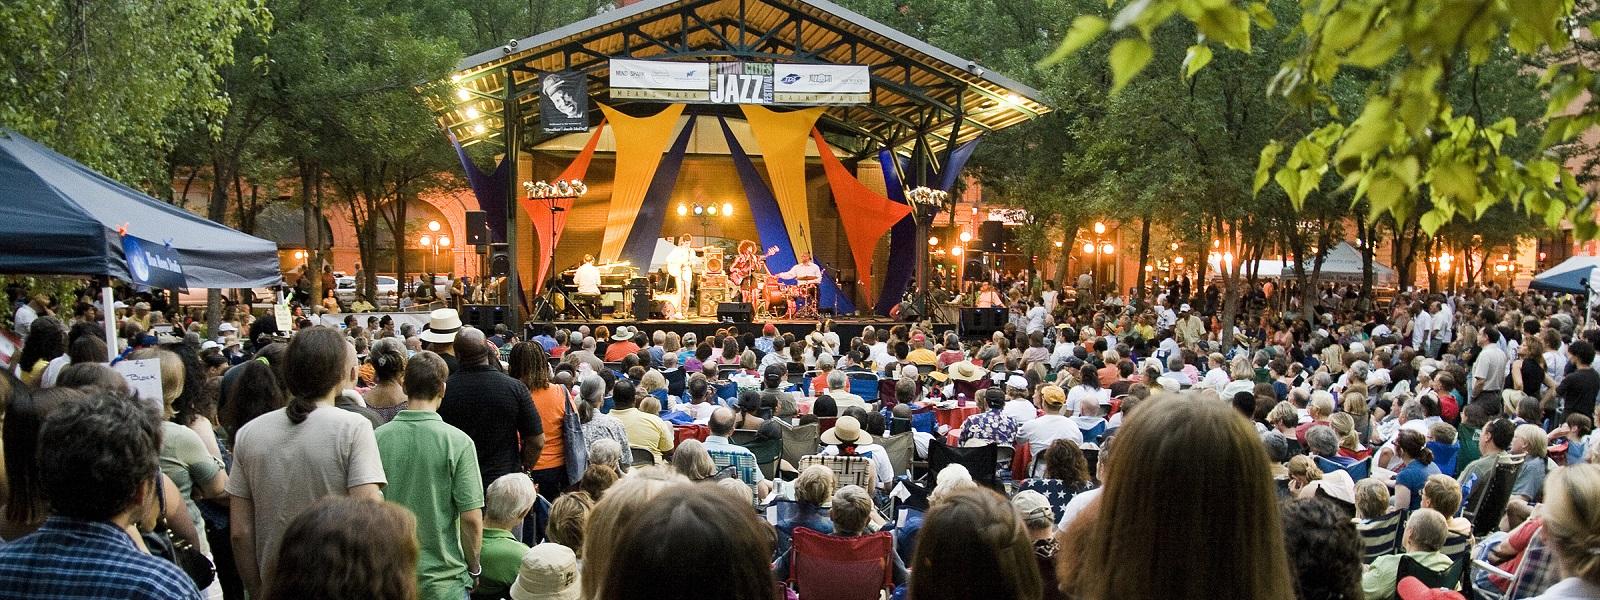 Twin Cities Jazz Festival - Mears Park, Lowertown, Saint